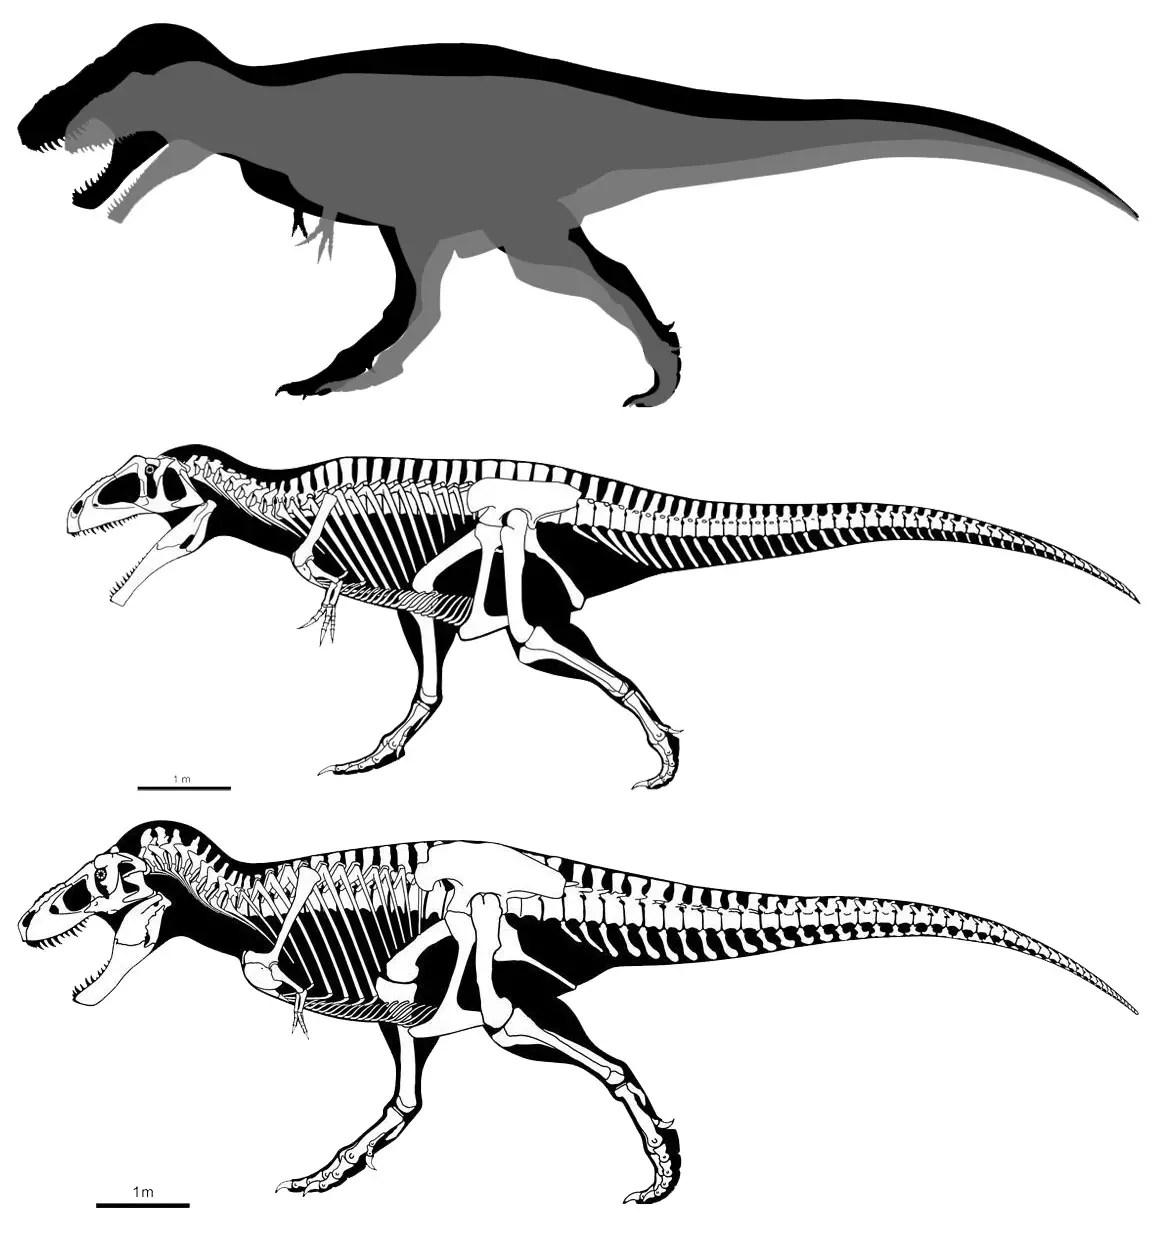 Tyrannosaurus Rex Vs Giganotosaurus Dinosaurs Forum